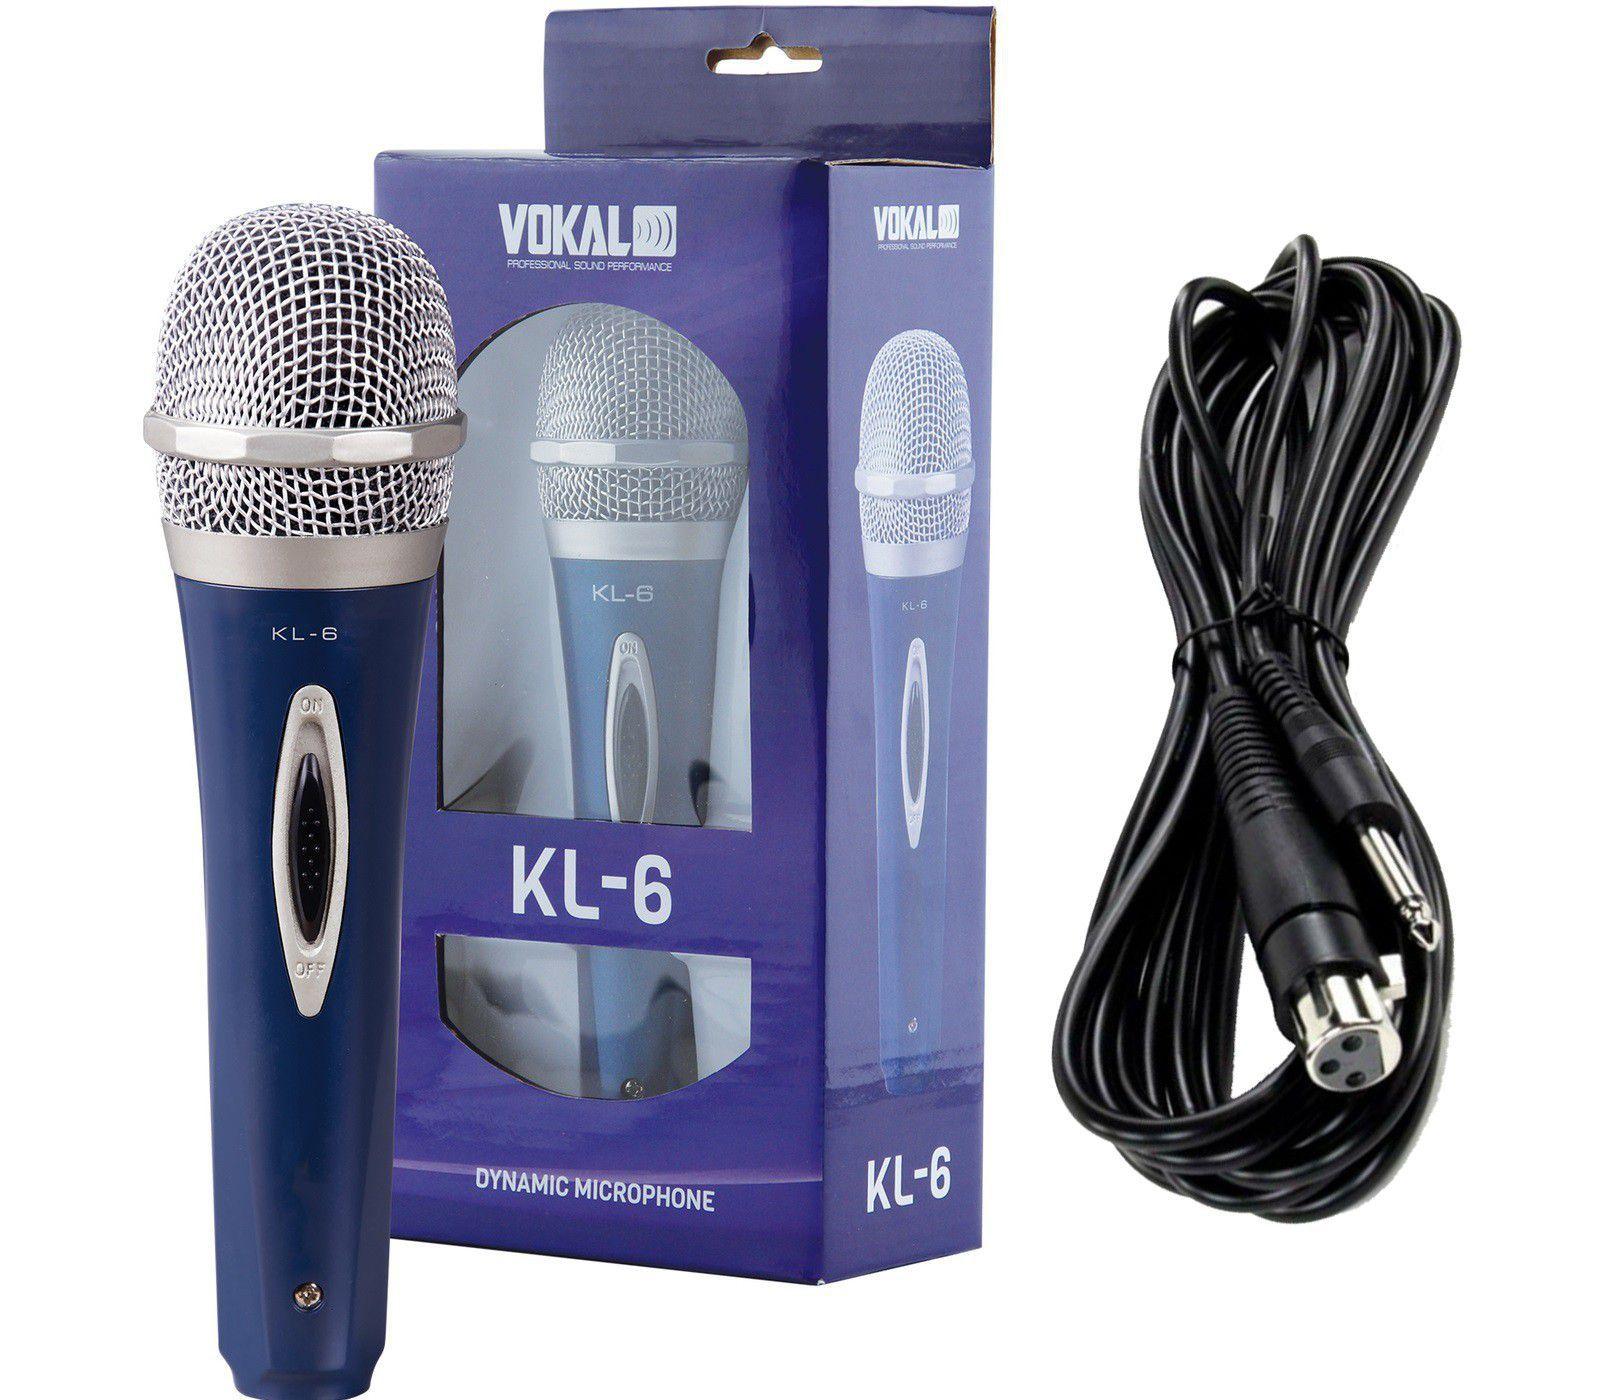 Kit 5 Microfone Profissional Com Fio Vokal Kl6